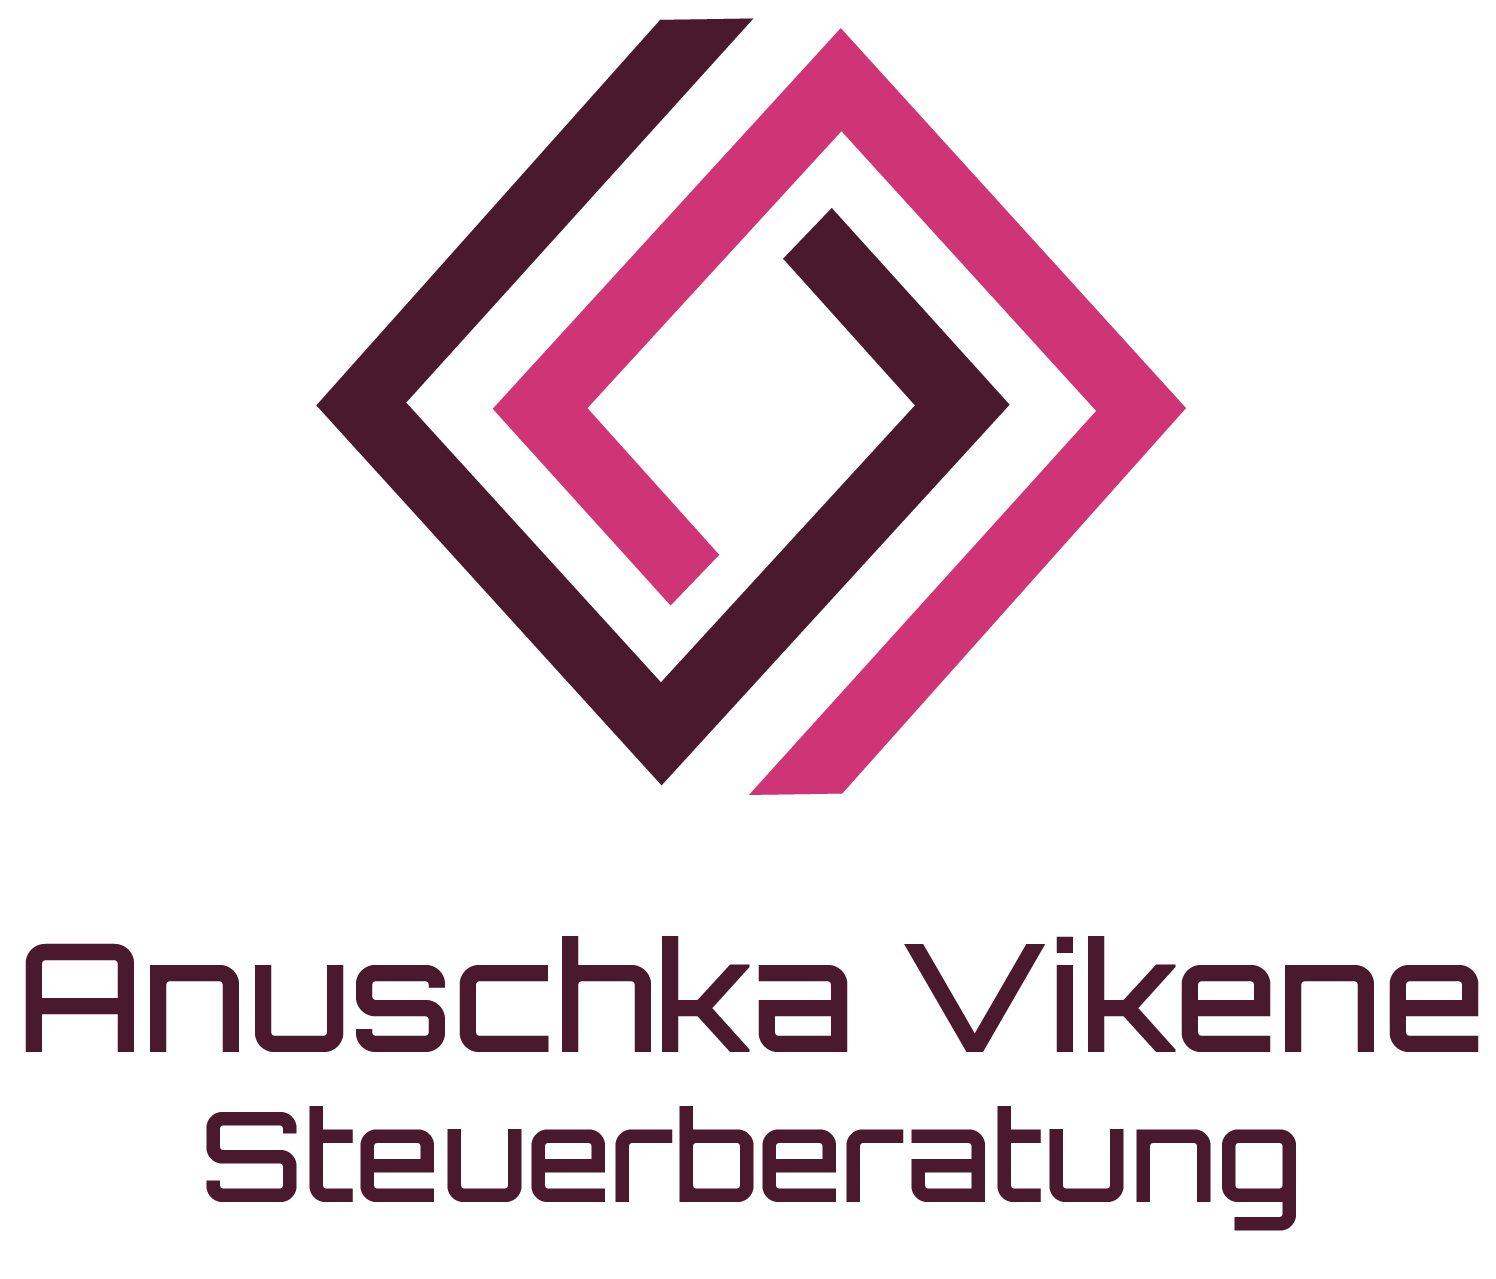 Anuschka Vikene Steuerberaterin